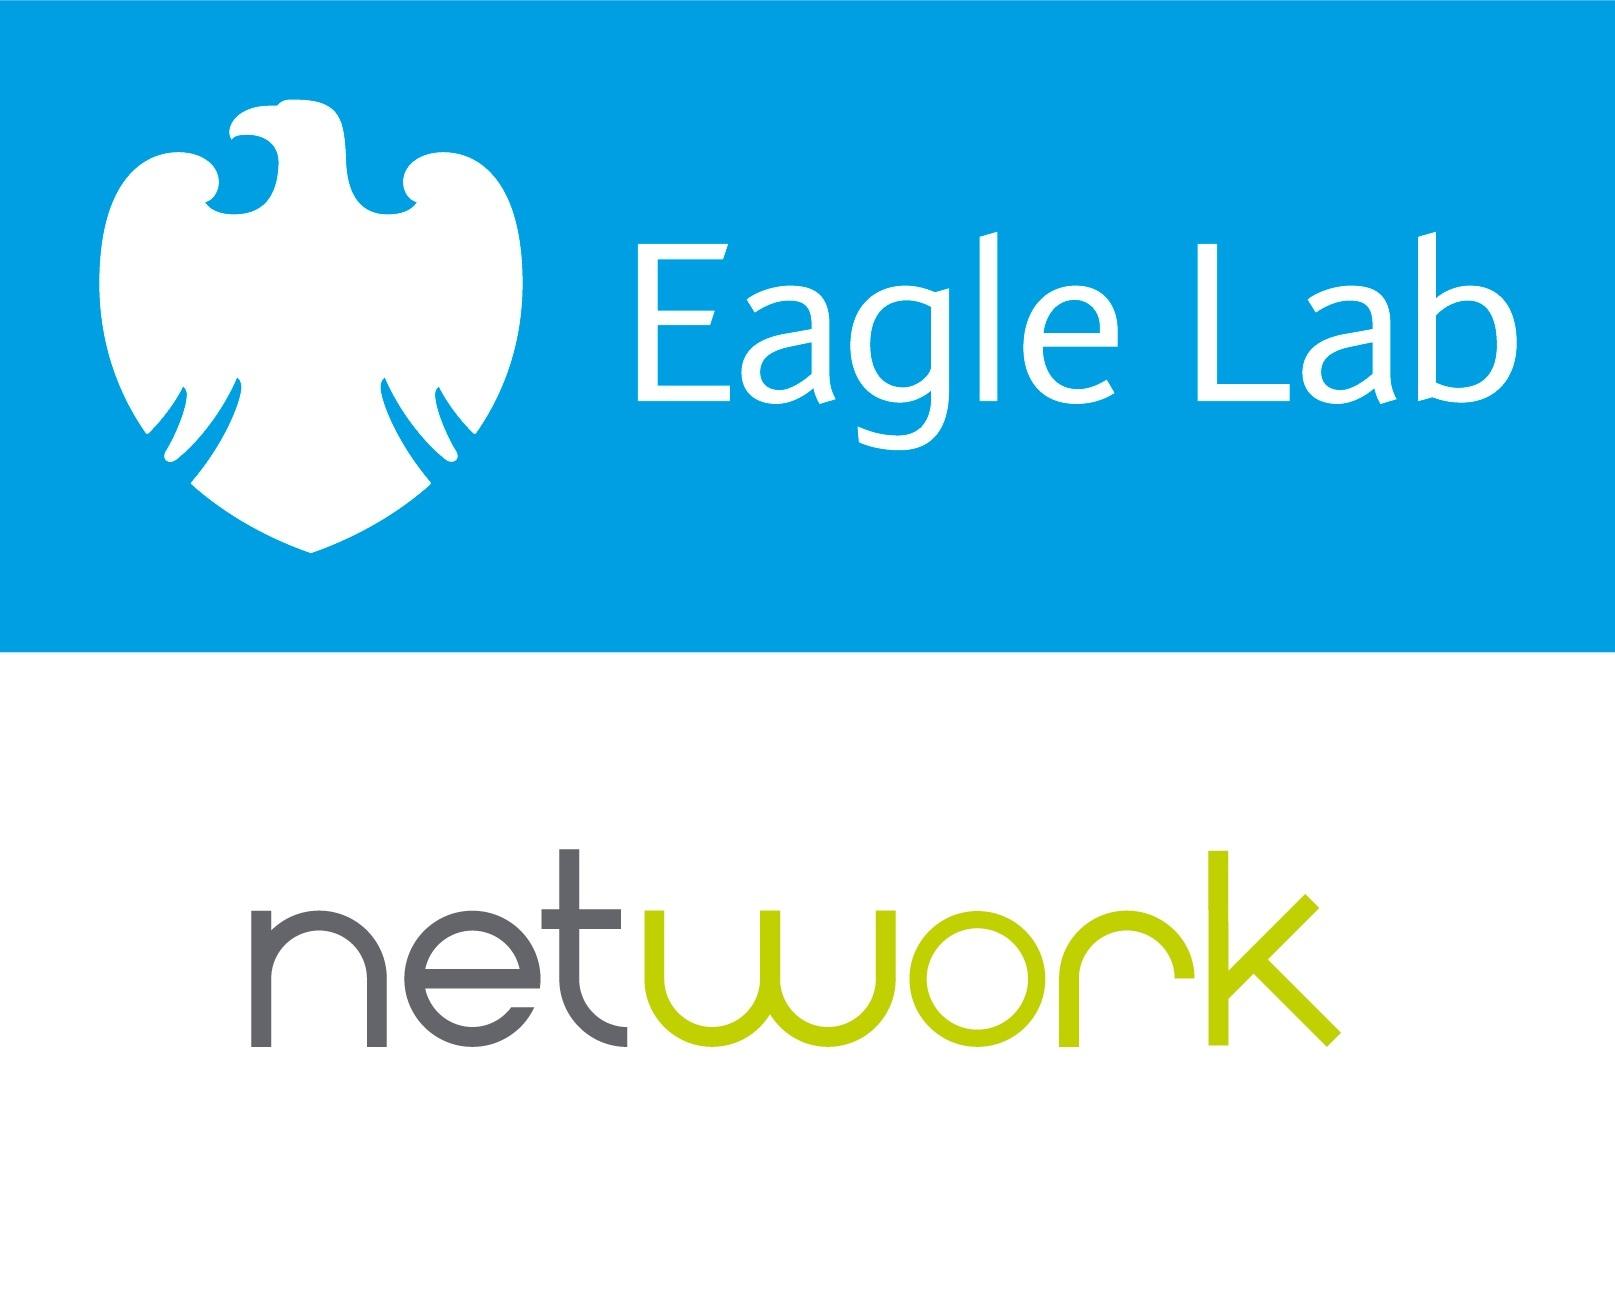 Network Eagle Lab